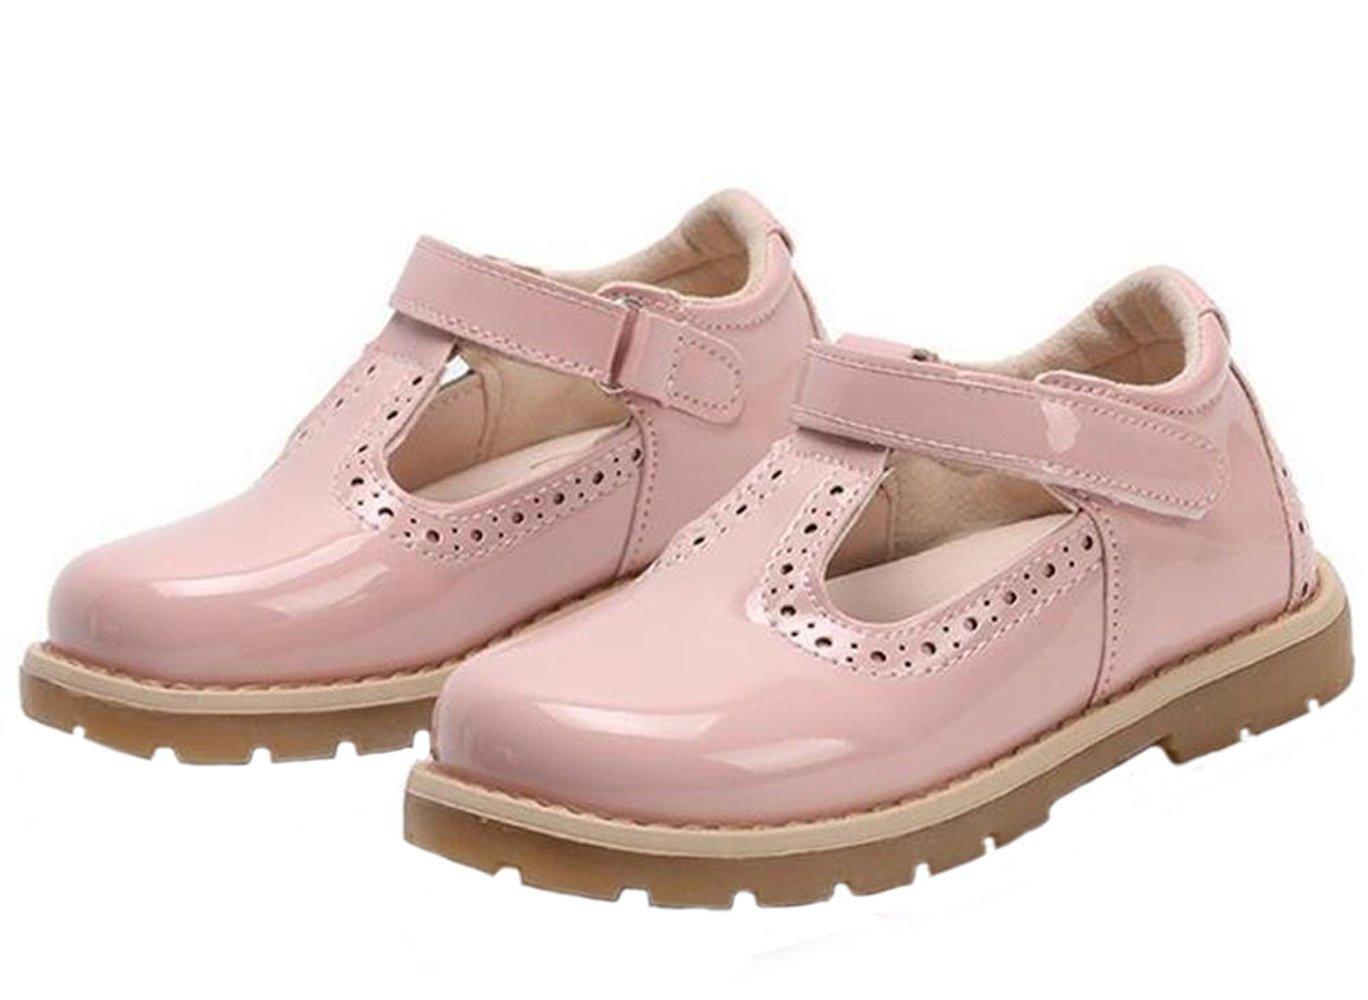 WUIWUIYU Girls' Fashion Princess Dress Oxfords Shoes Leather British Retro T-Strap Mary Jane Flats